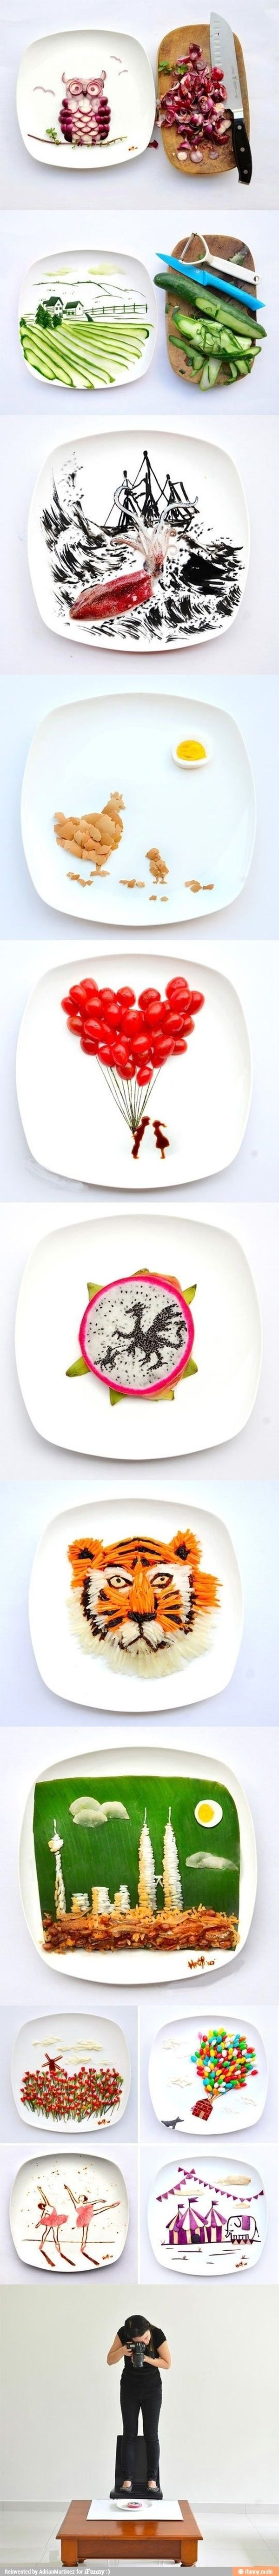 best prettydeliciousudart images on pinterest amazing cakes